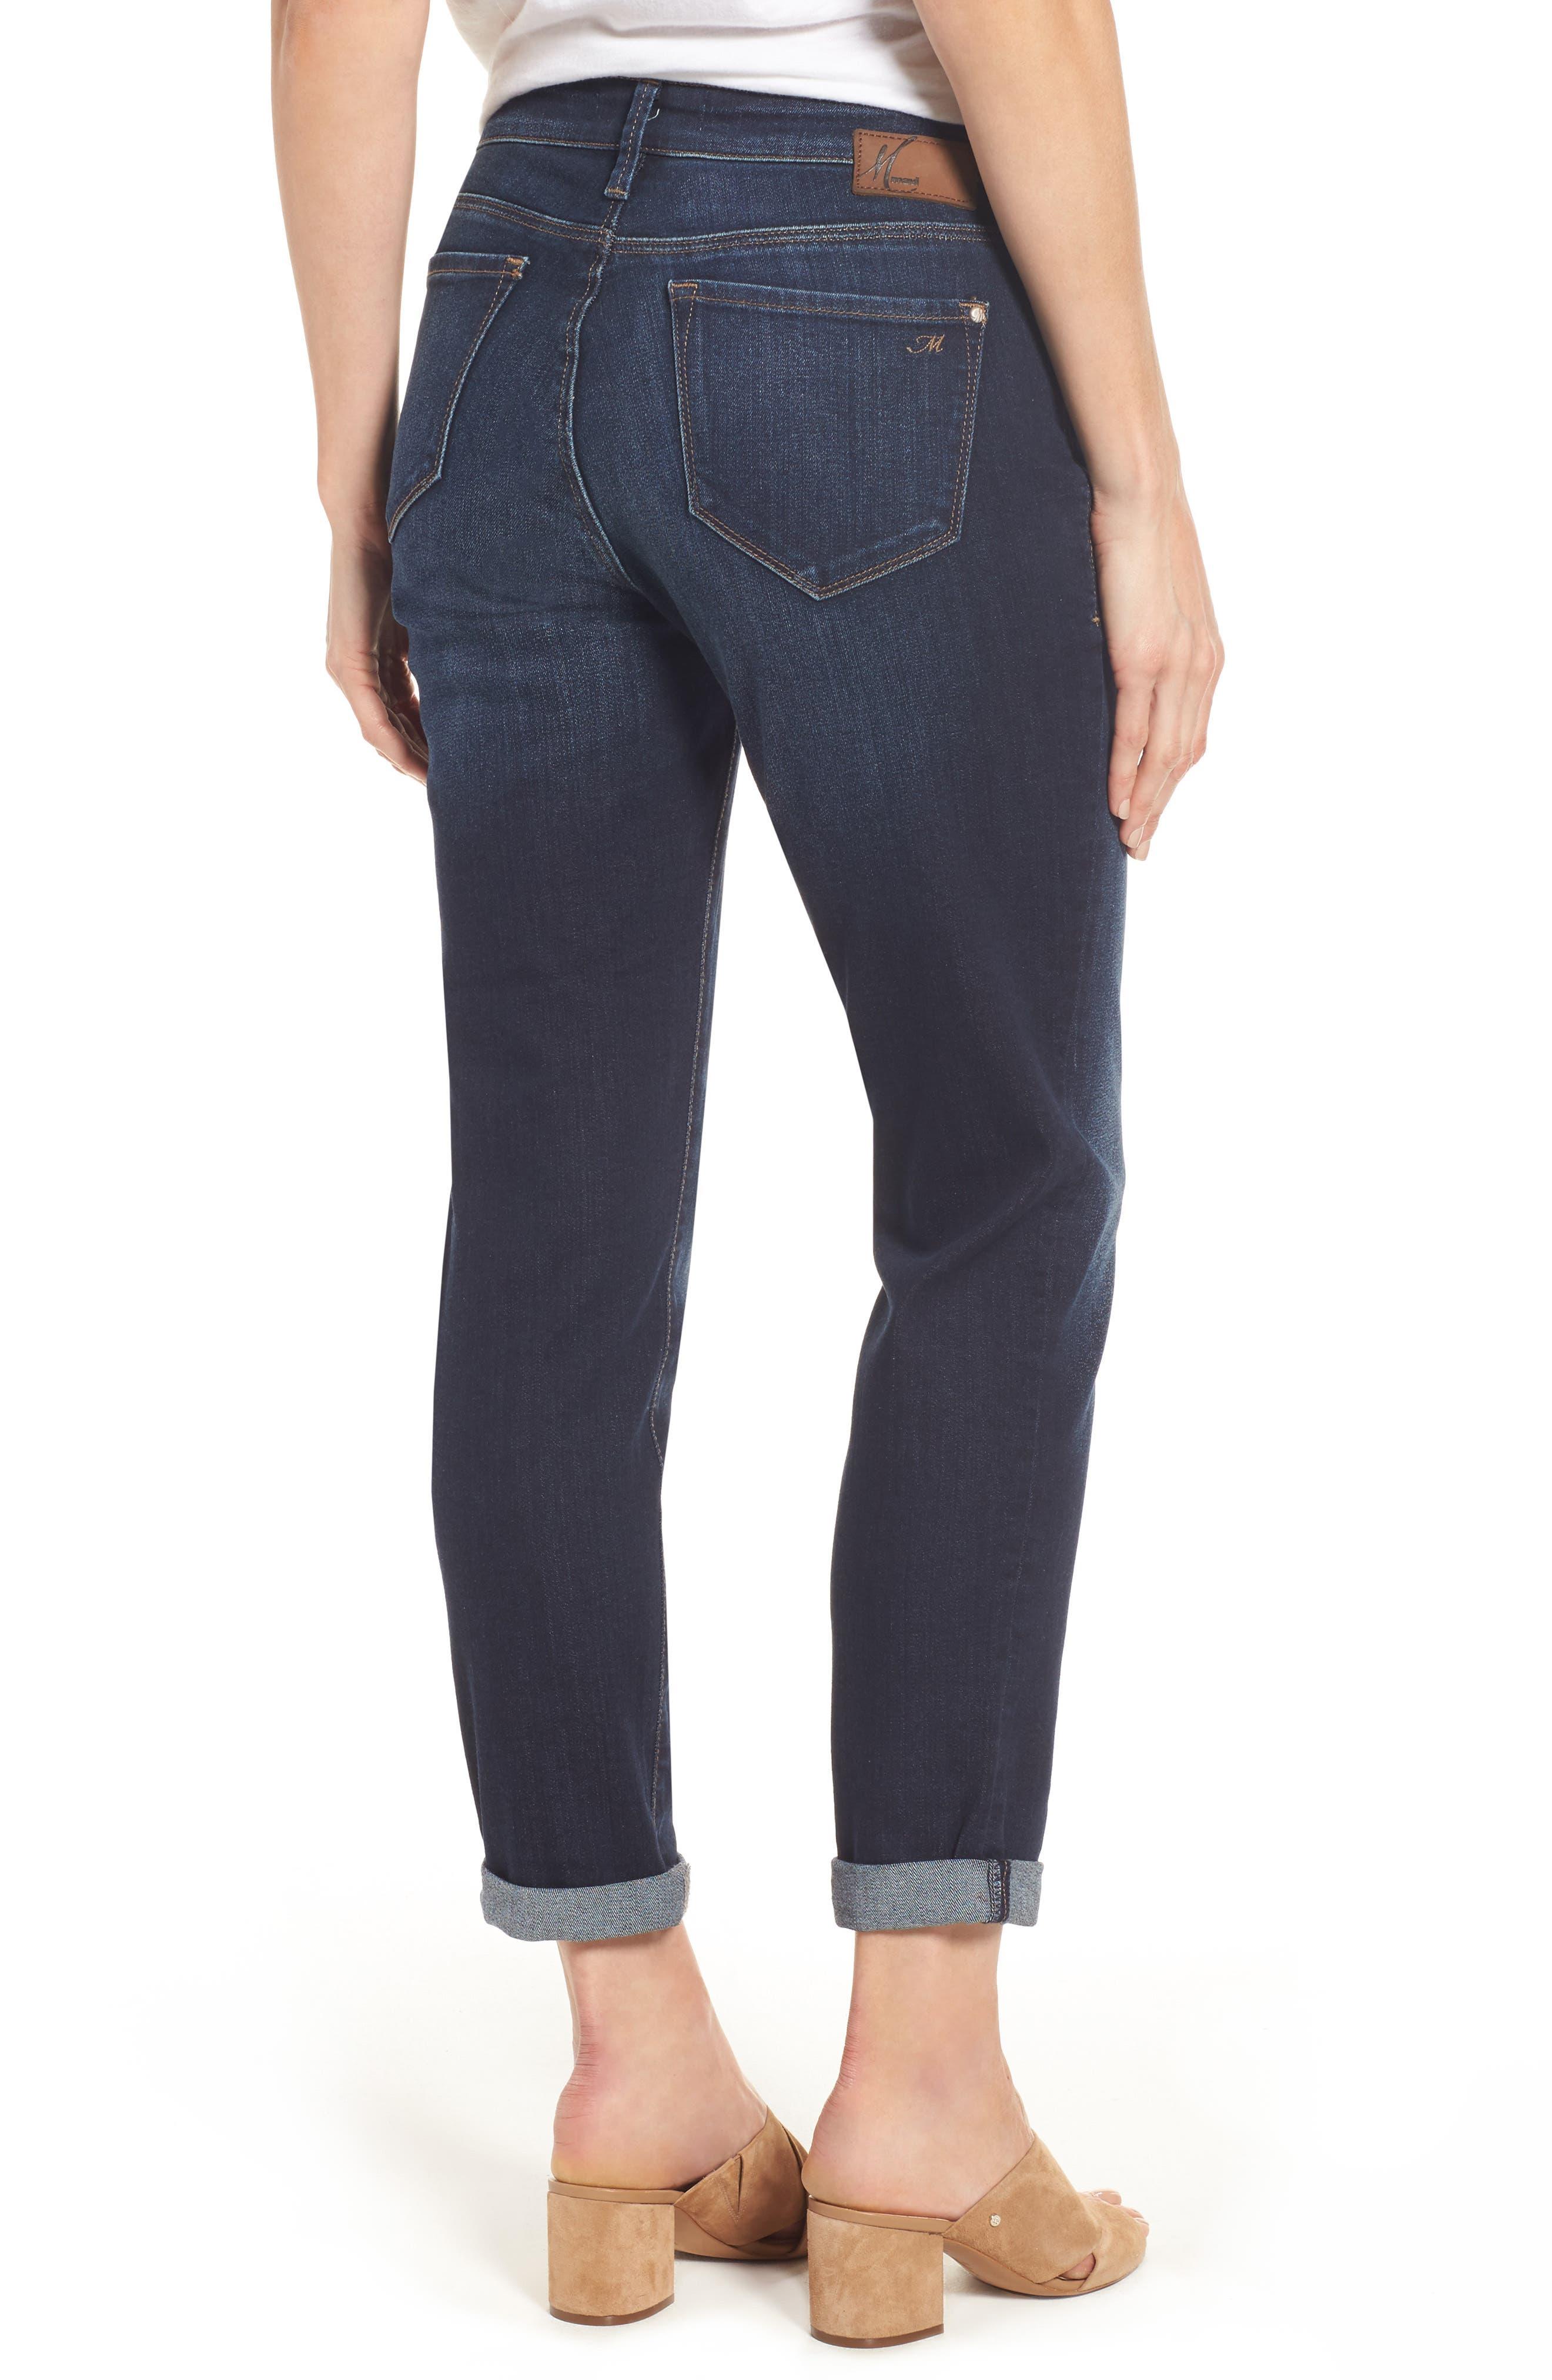 Ada Boyfriend Jeans,                             Alternate thumbnail 2, color,                             INDIGO BRUSHED